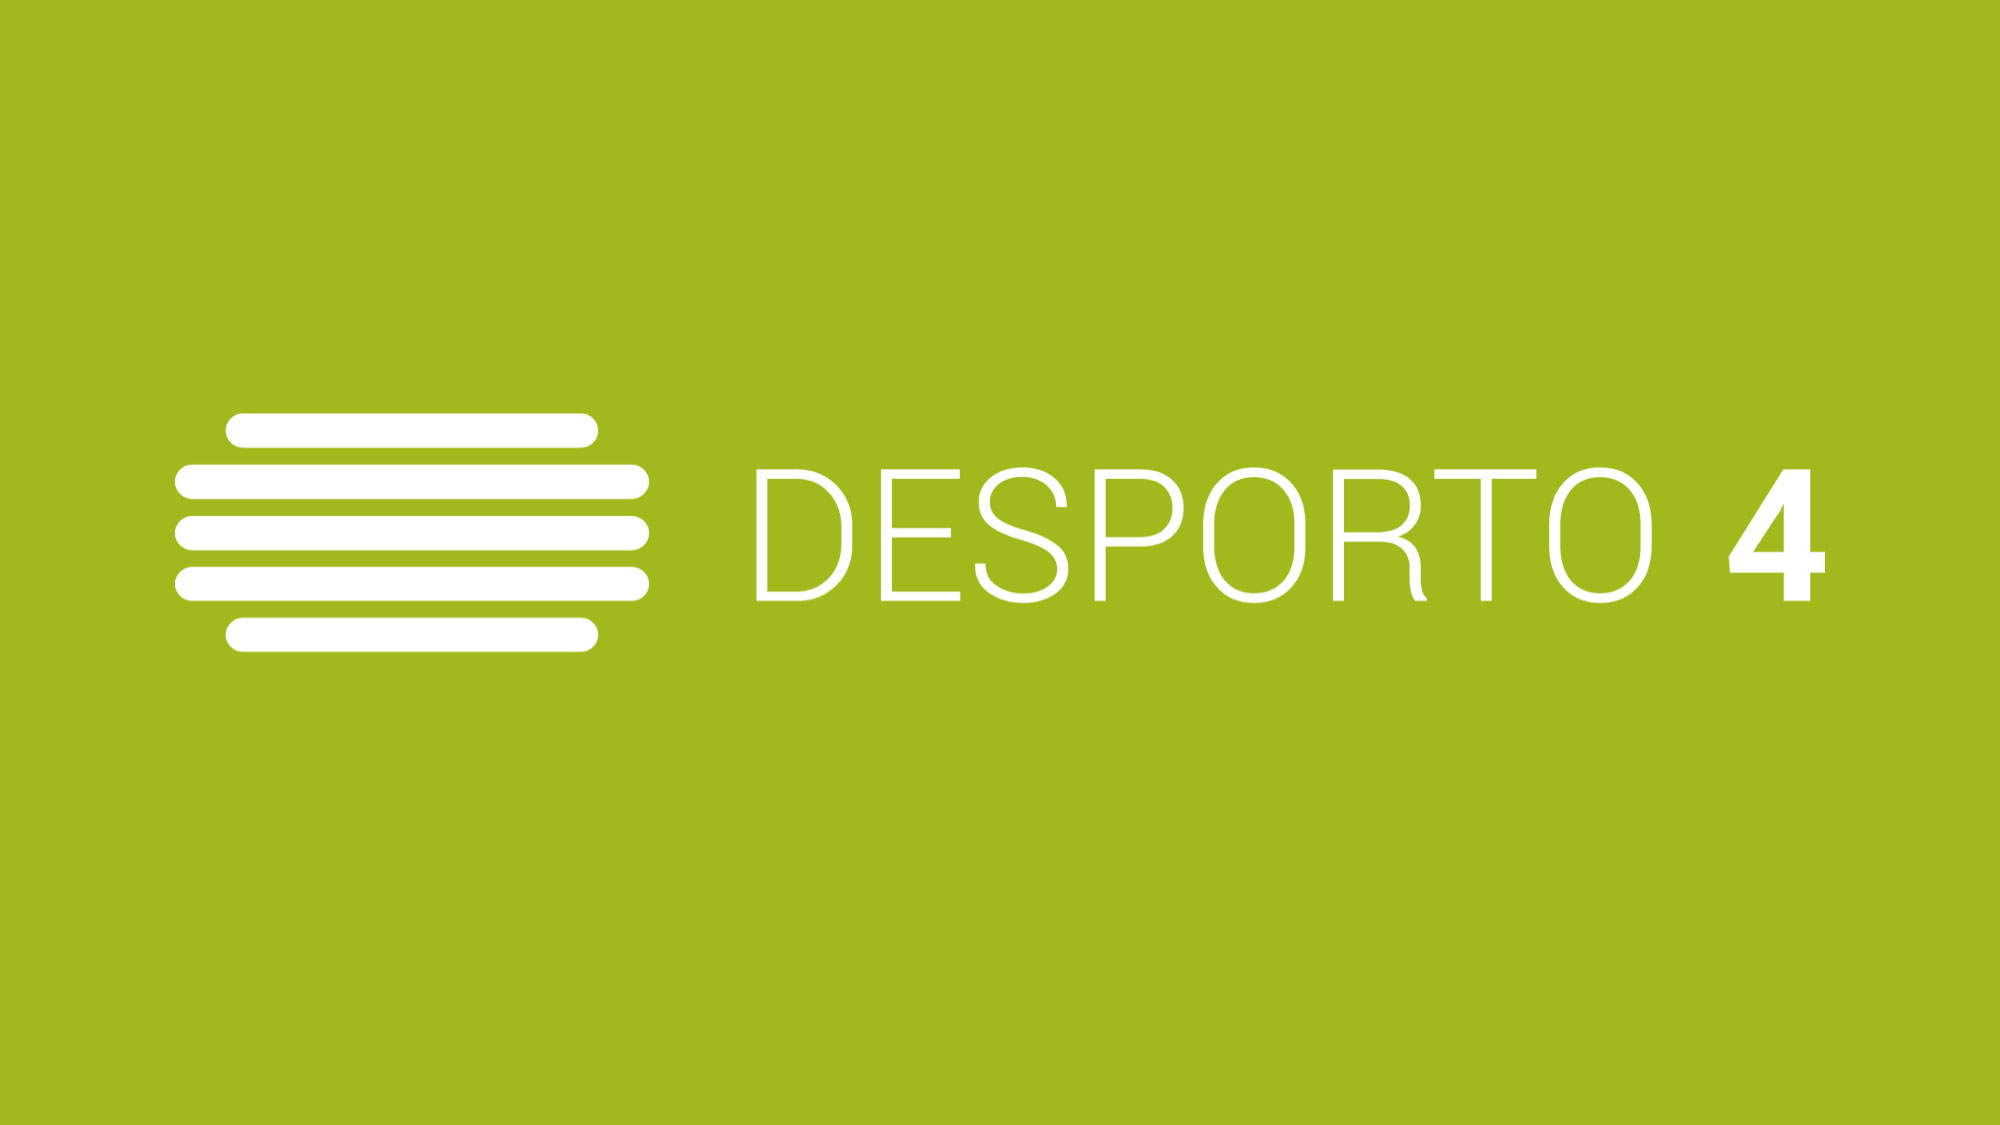 Radio lusitania portugal online dating